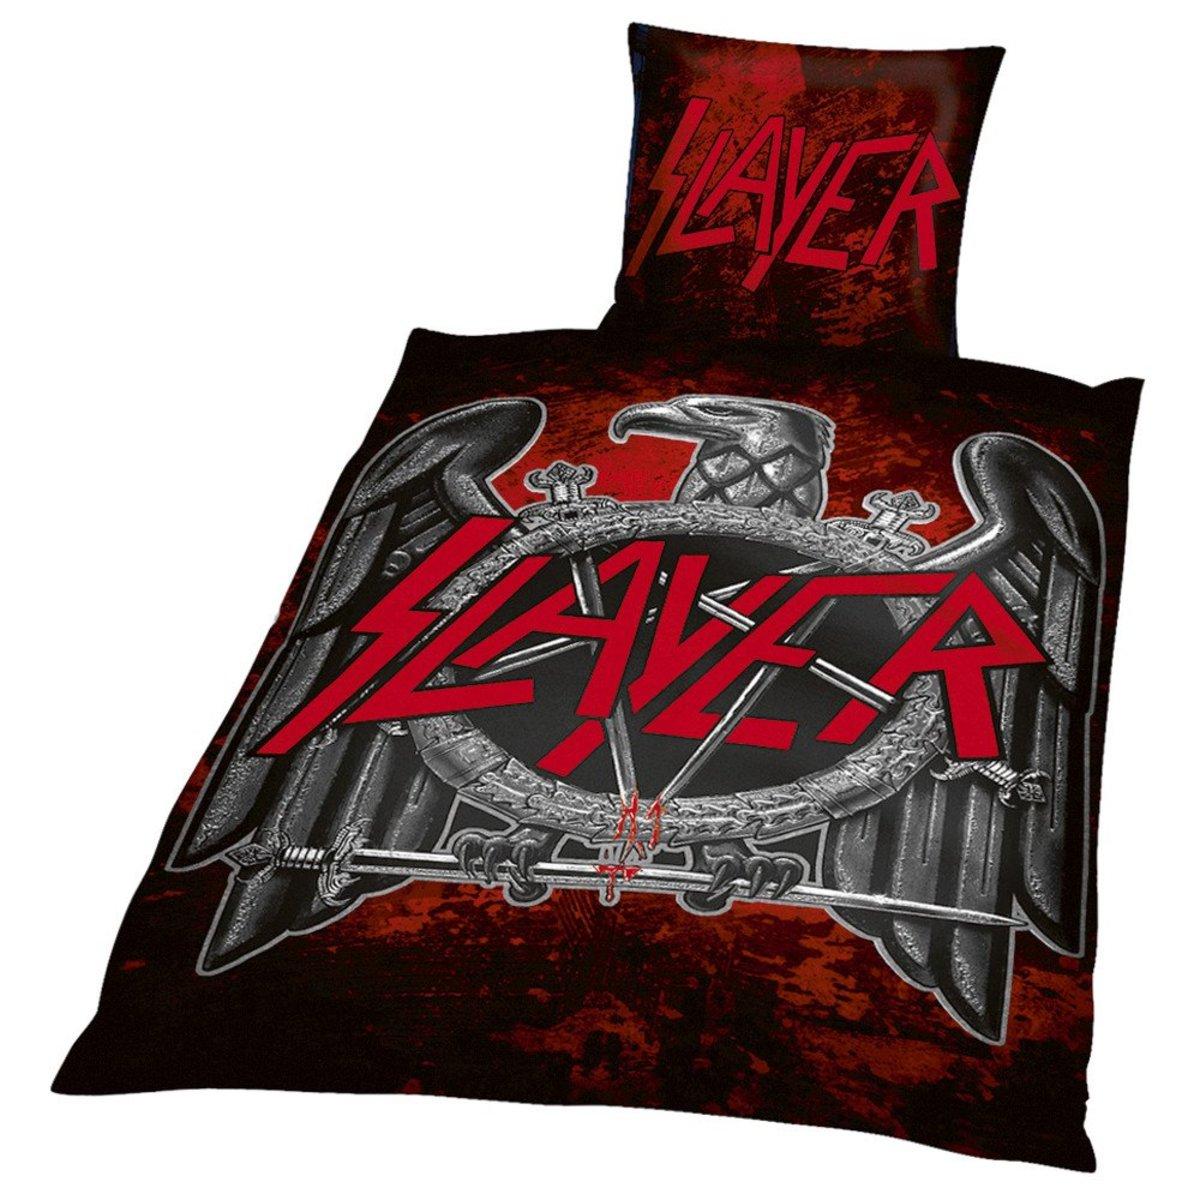 Bettwäsche Slayer Eagle Blsl01 Metalshopde